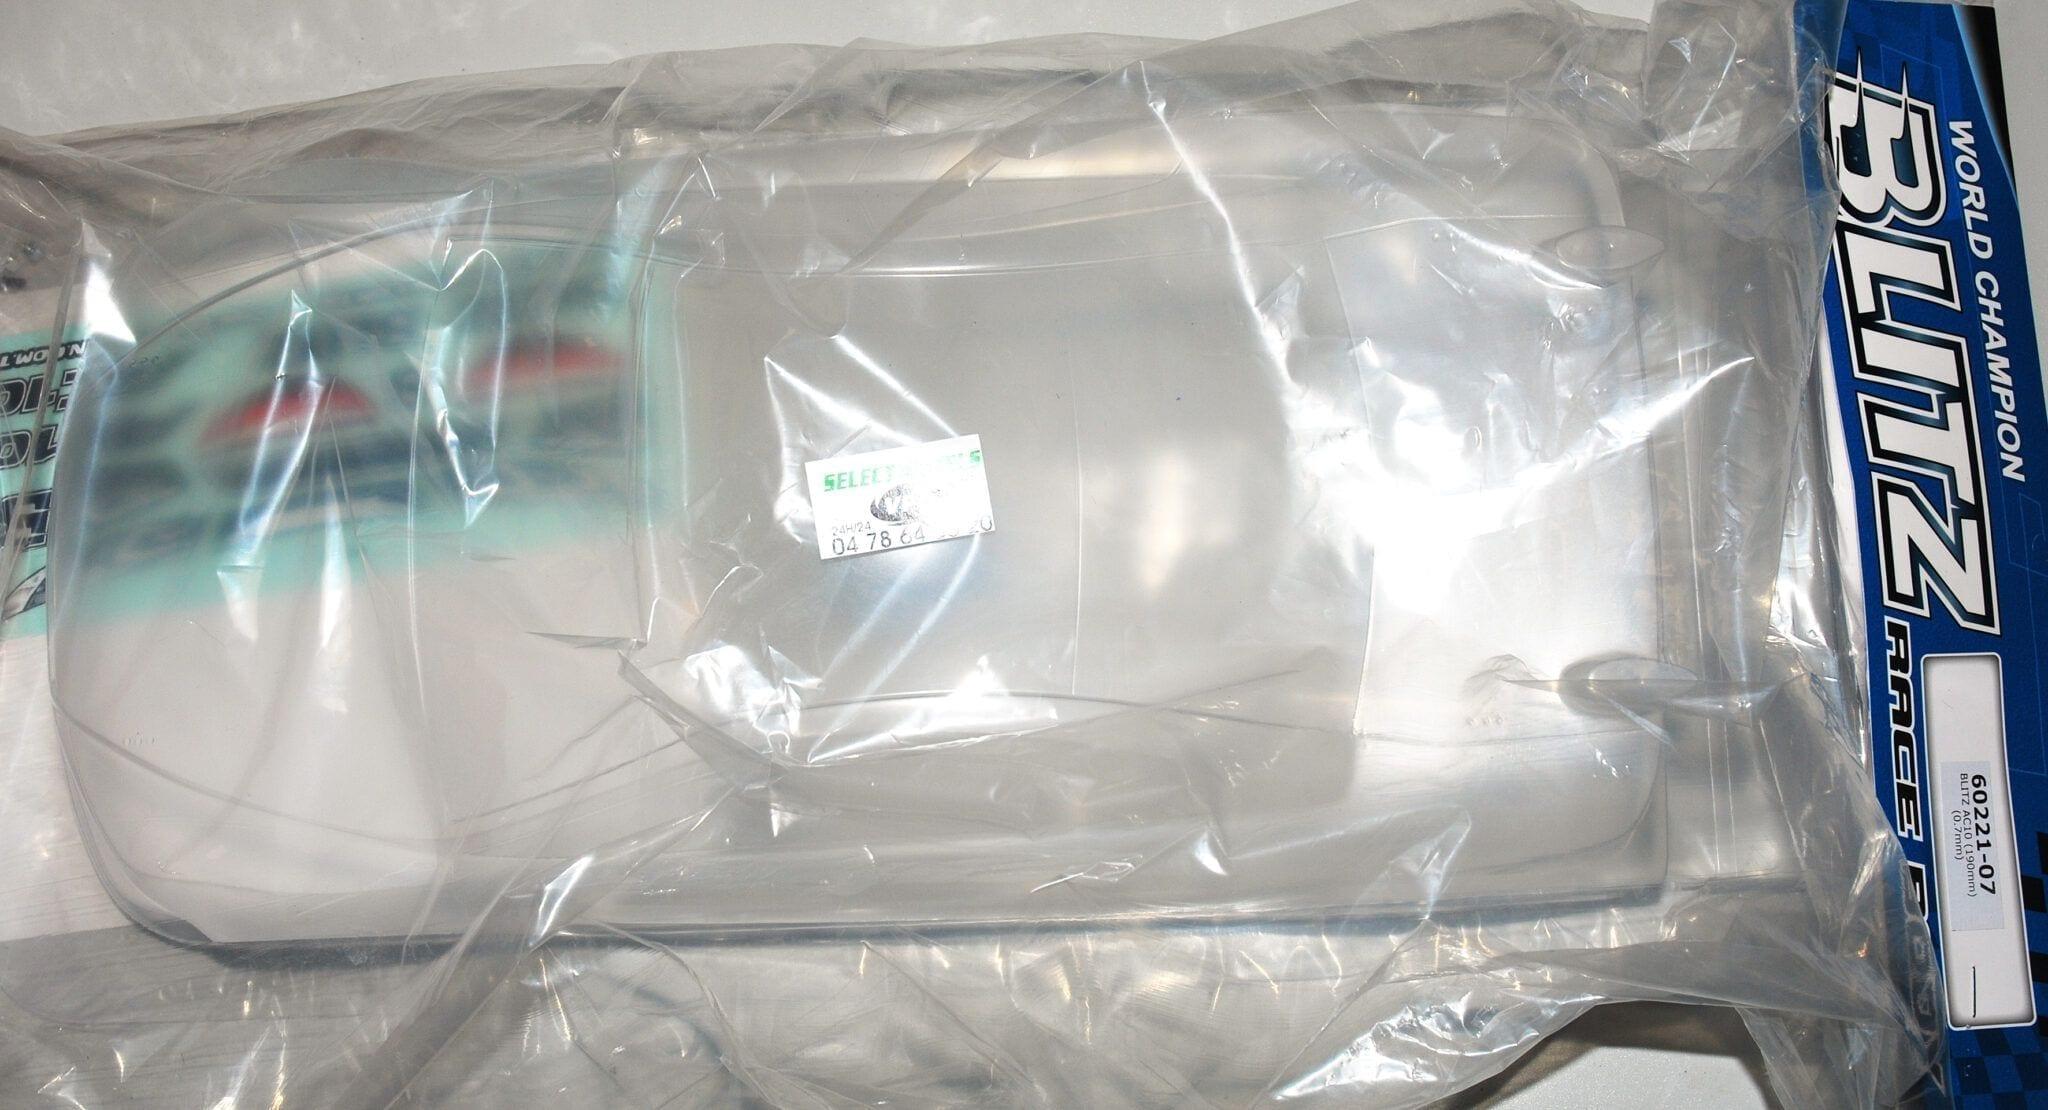 BLITZ AC10 0.7 190mm